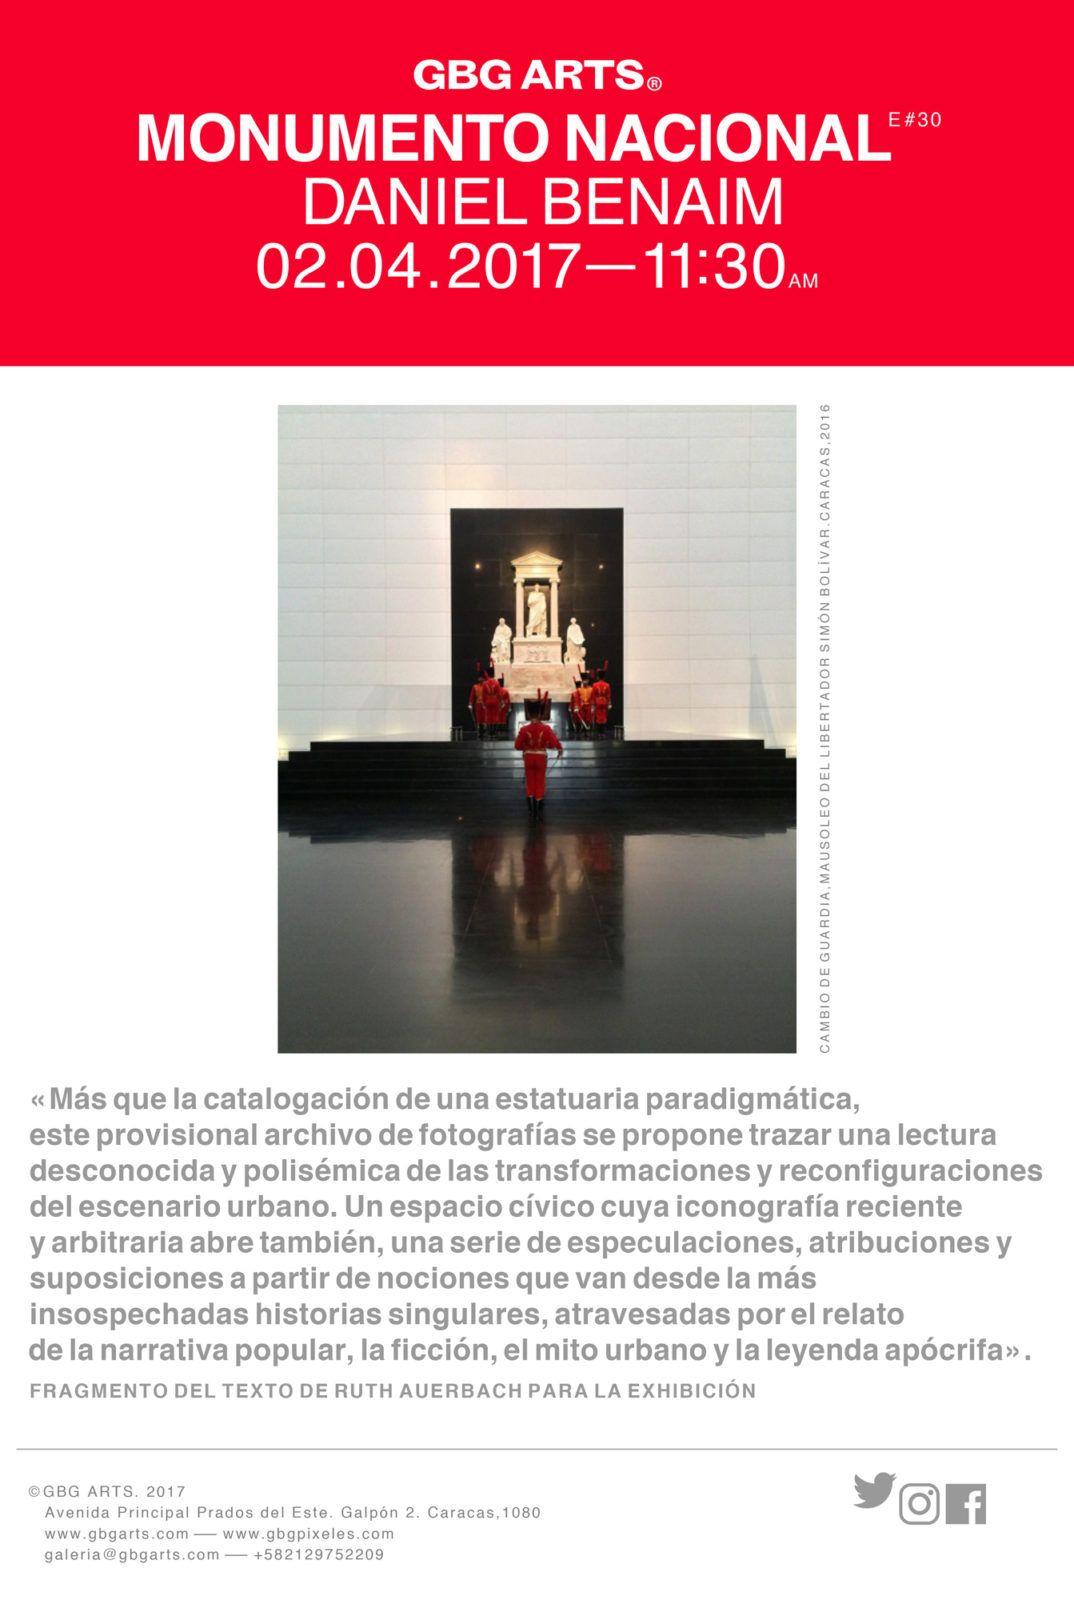 gbg_monumento-nacional_invitacion